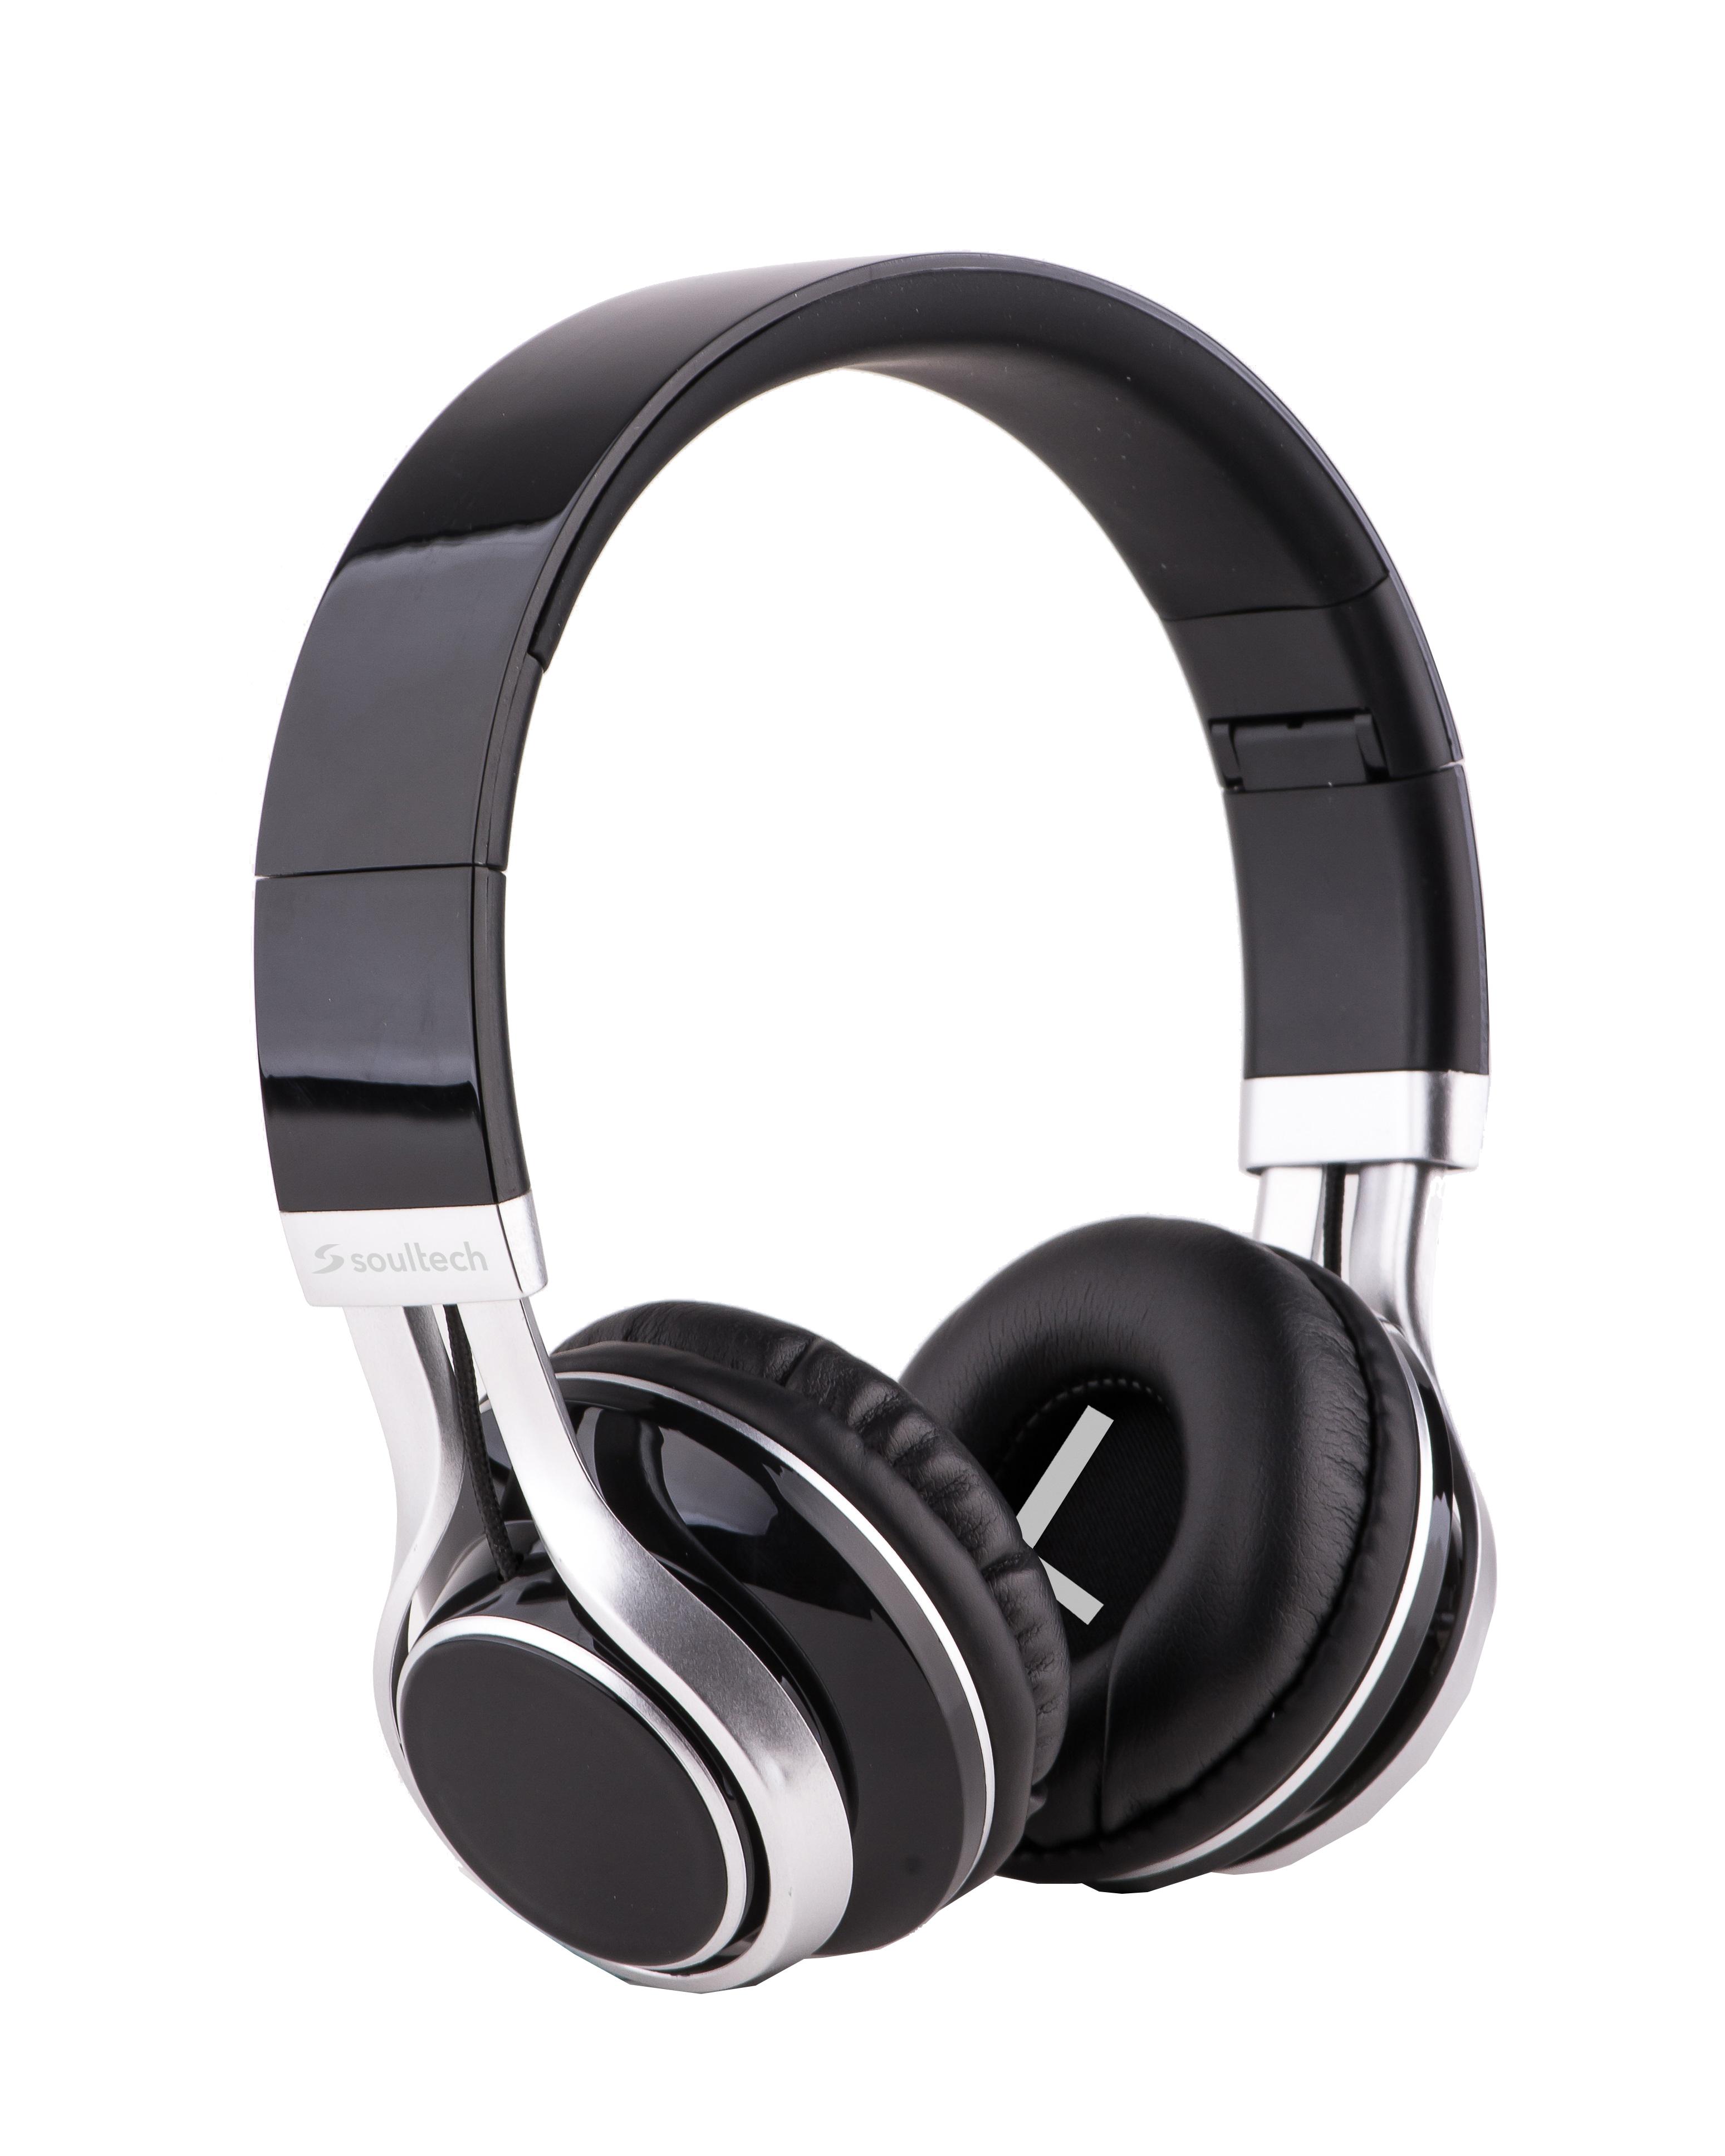 Soultech Soulbass (Mikrofonlu) Siyah-Gümüş Solo Kulaklık SK203SG  Siyah